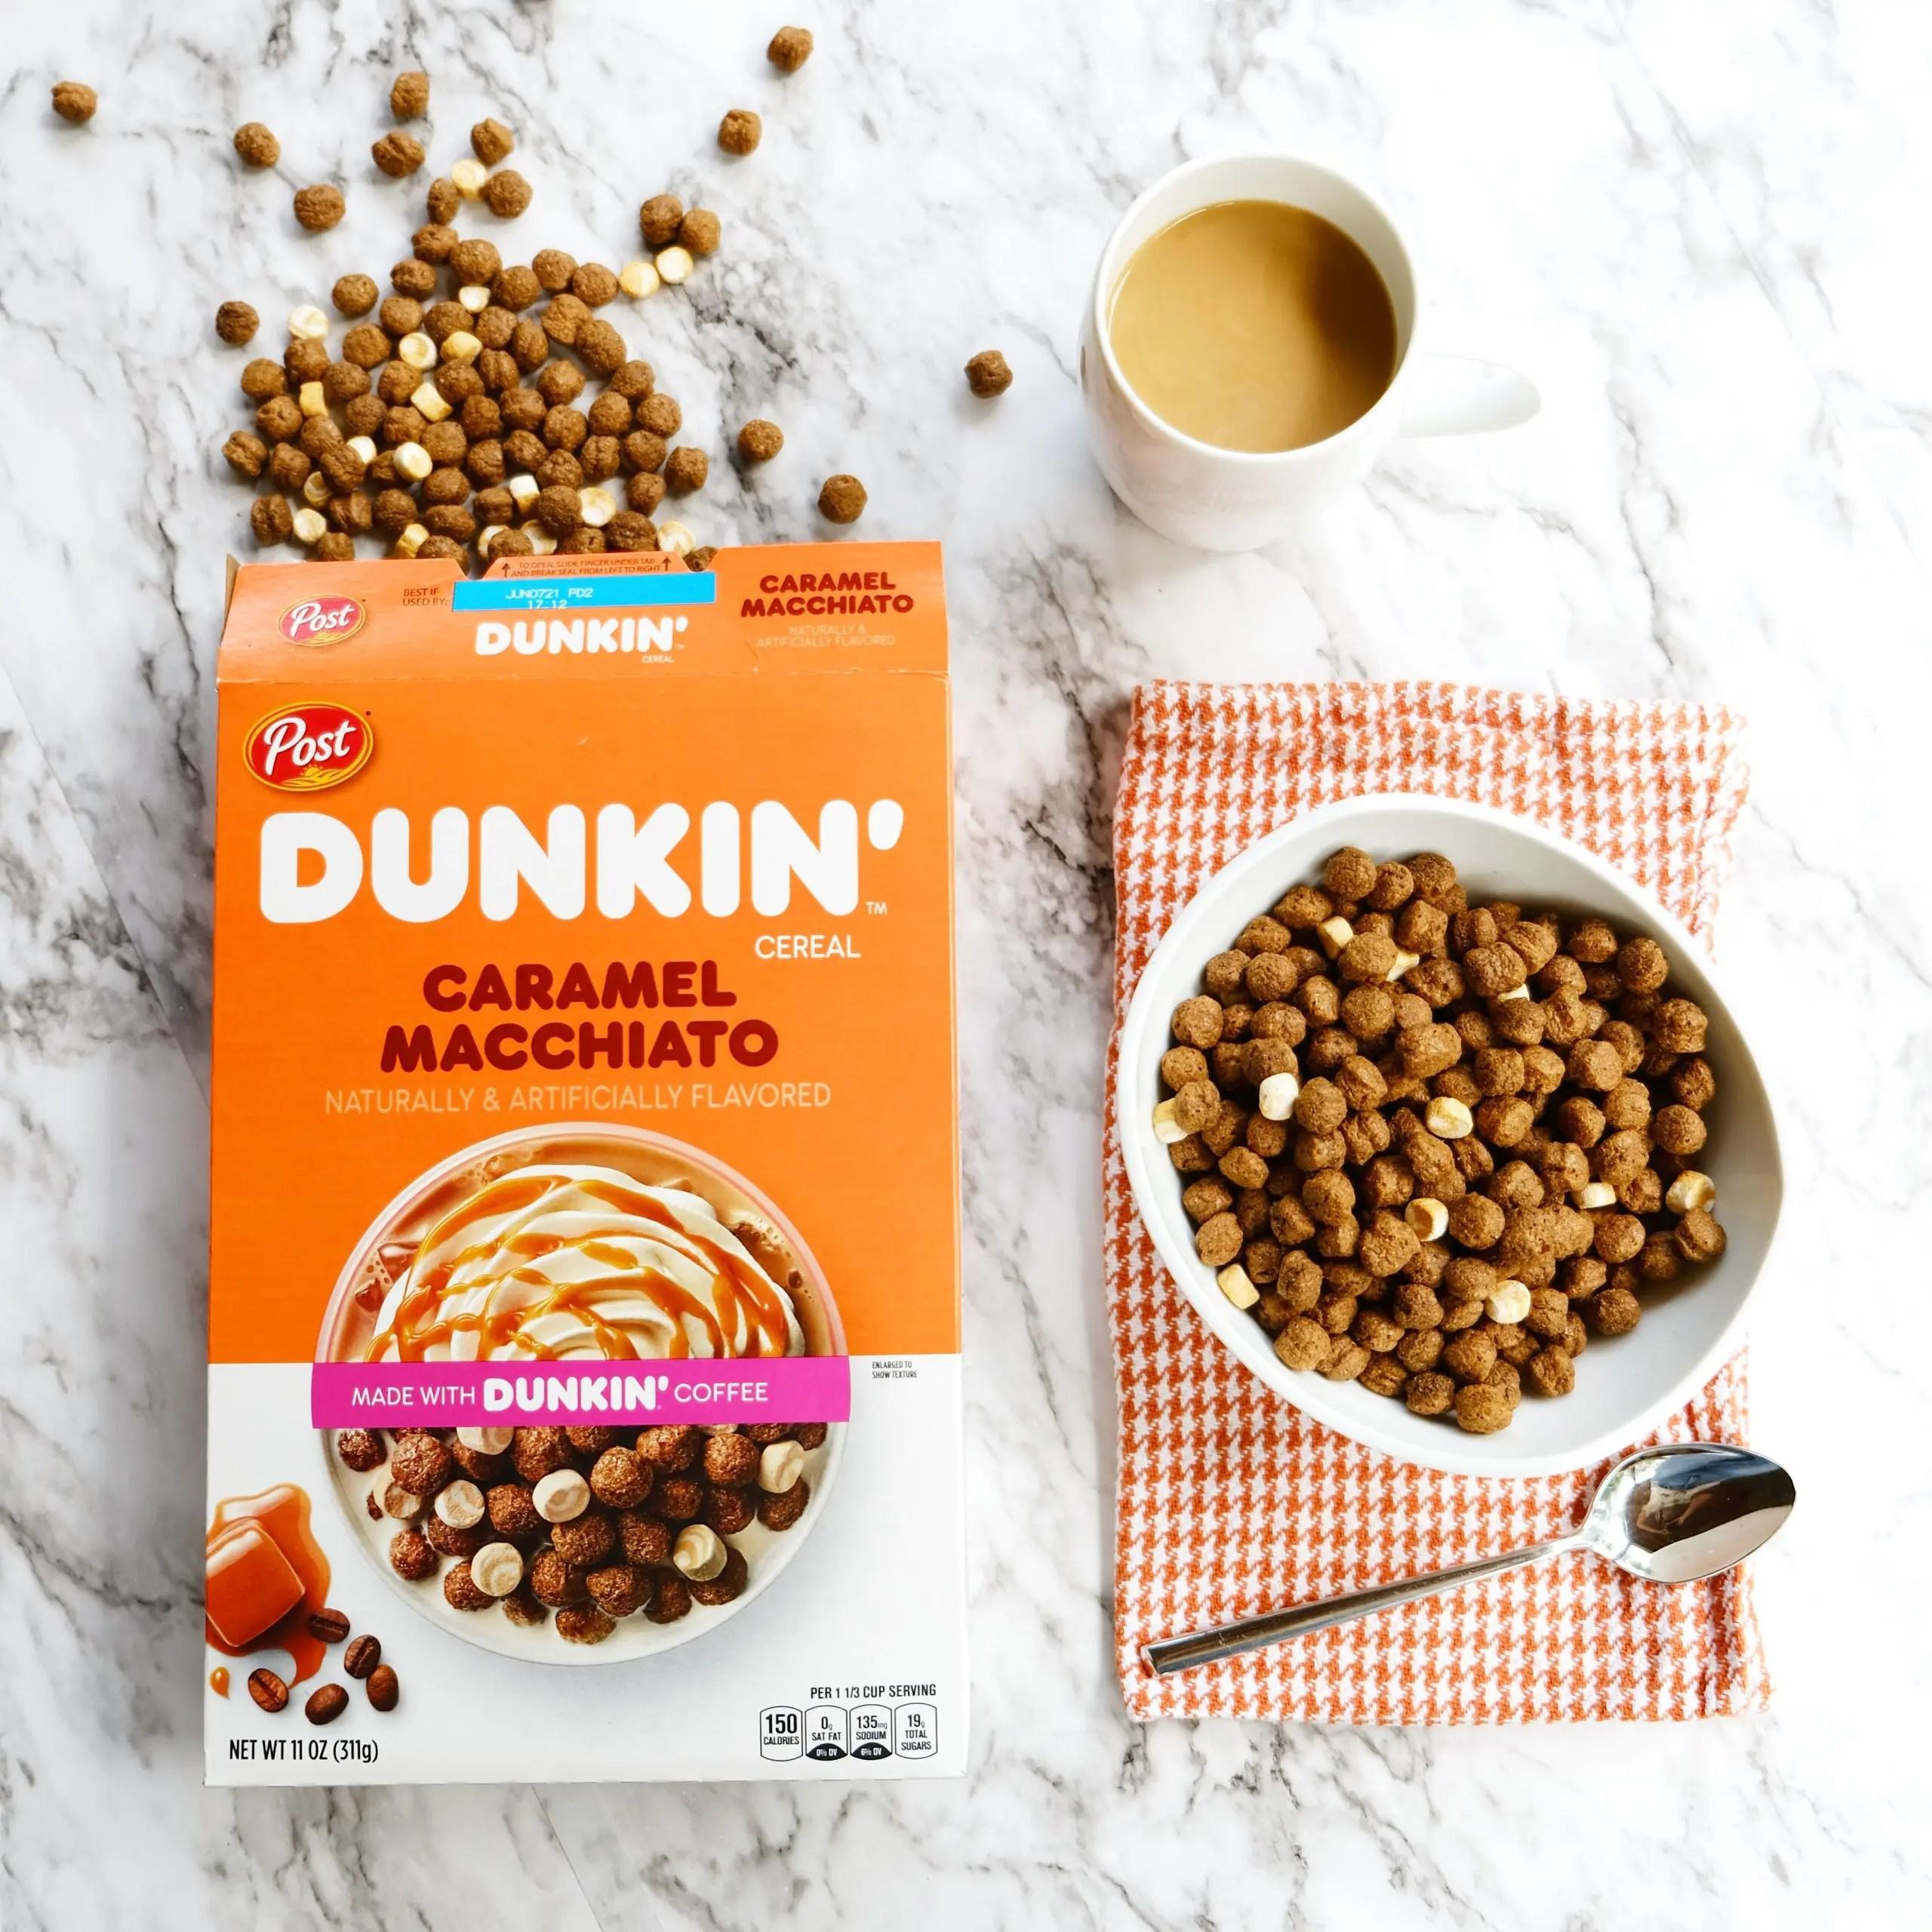 post dunkin caramel macchiato cereal